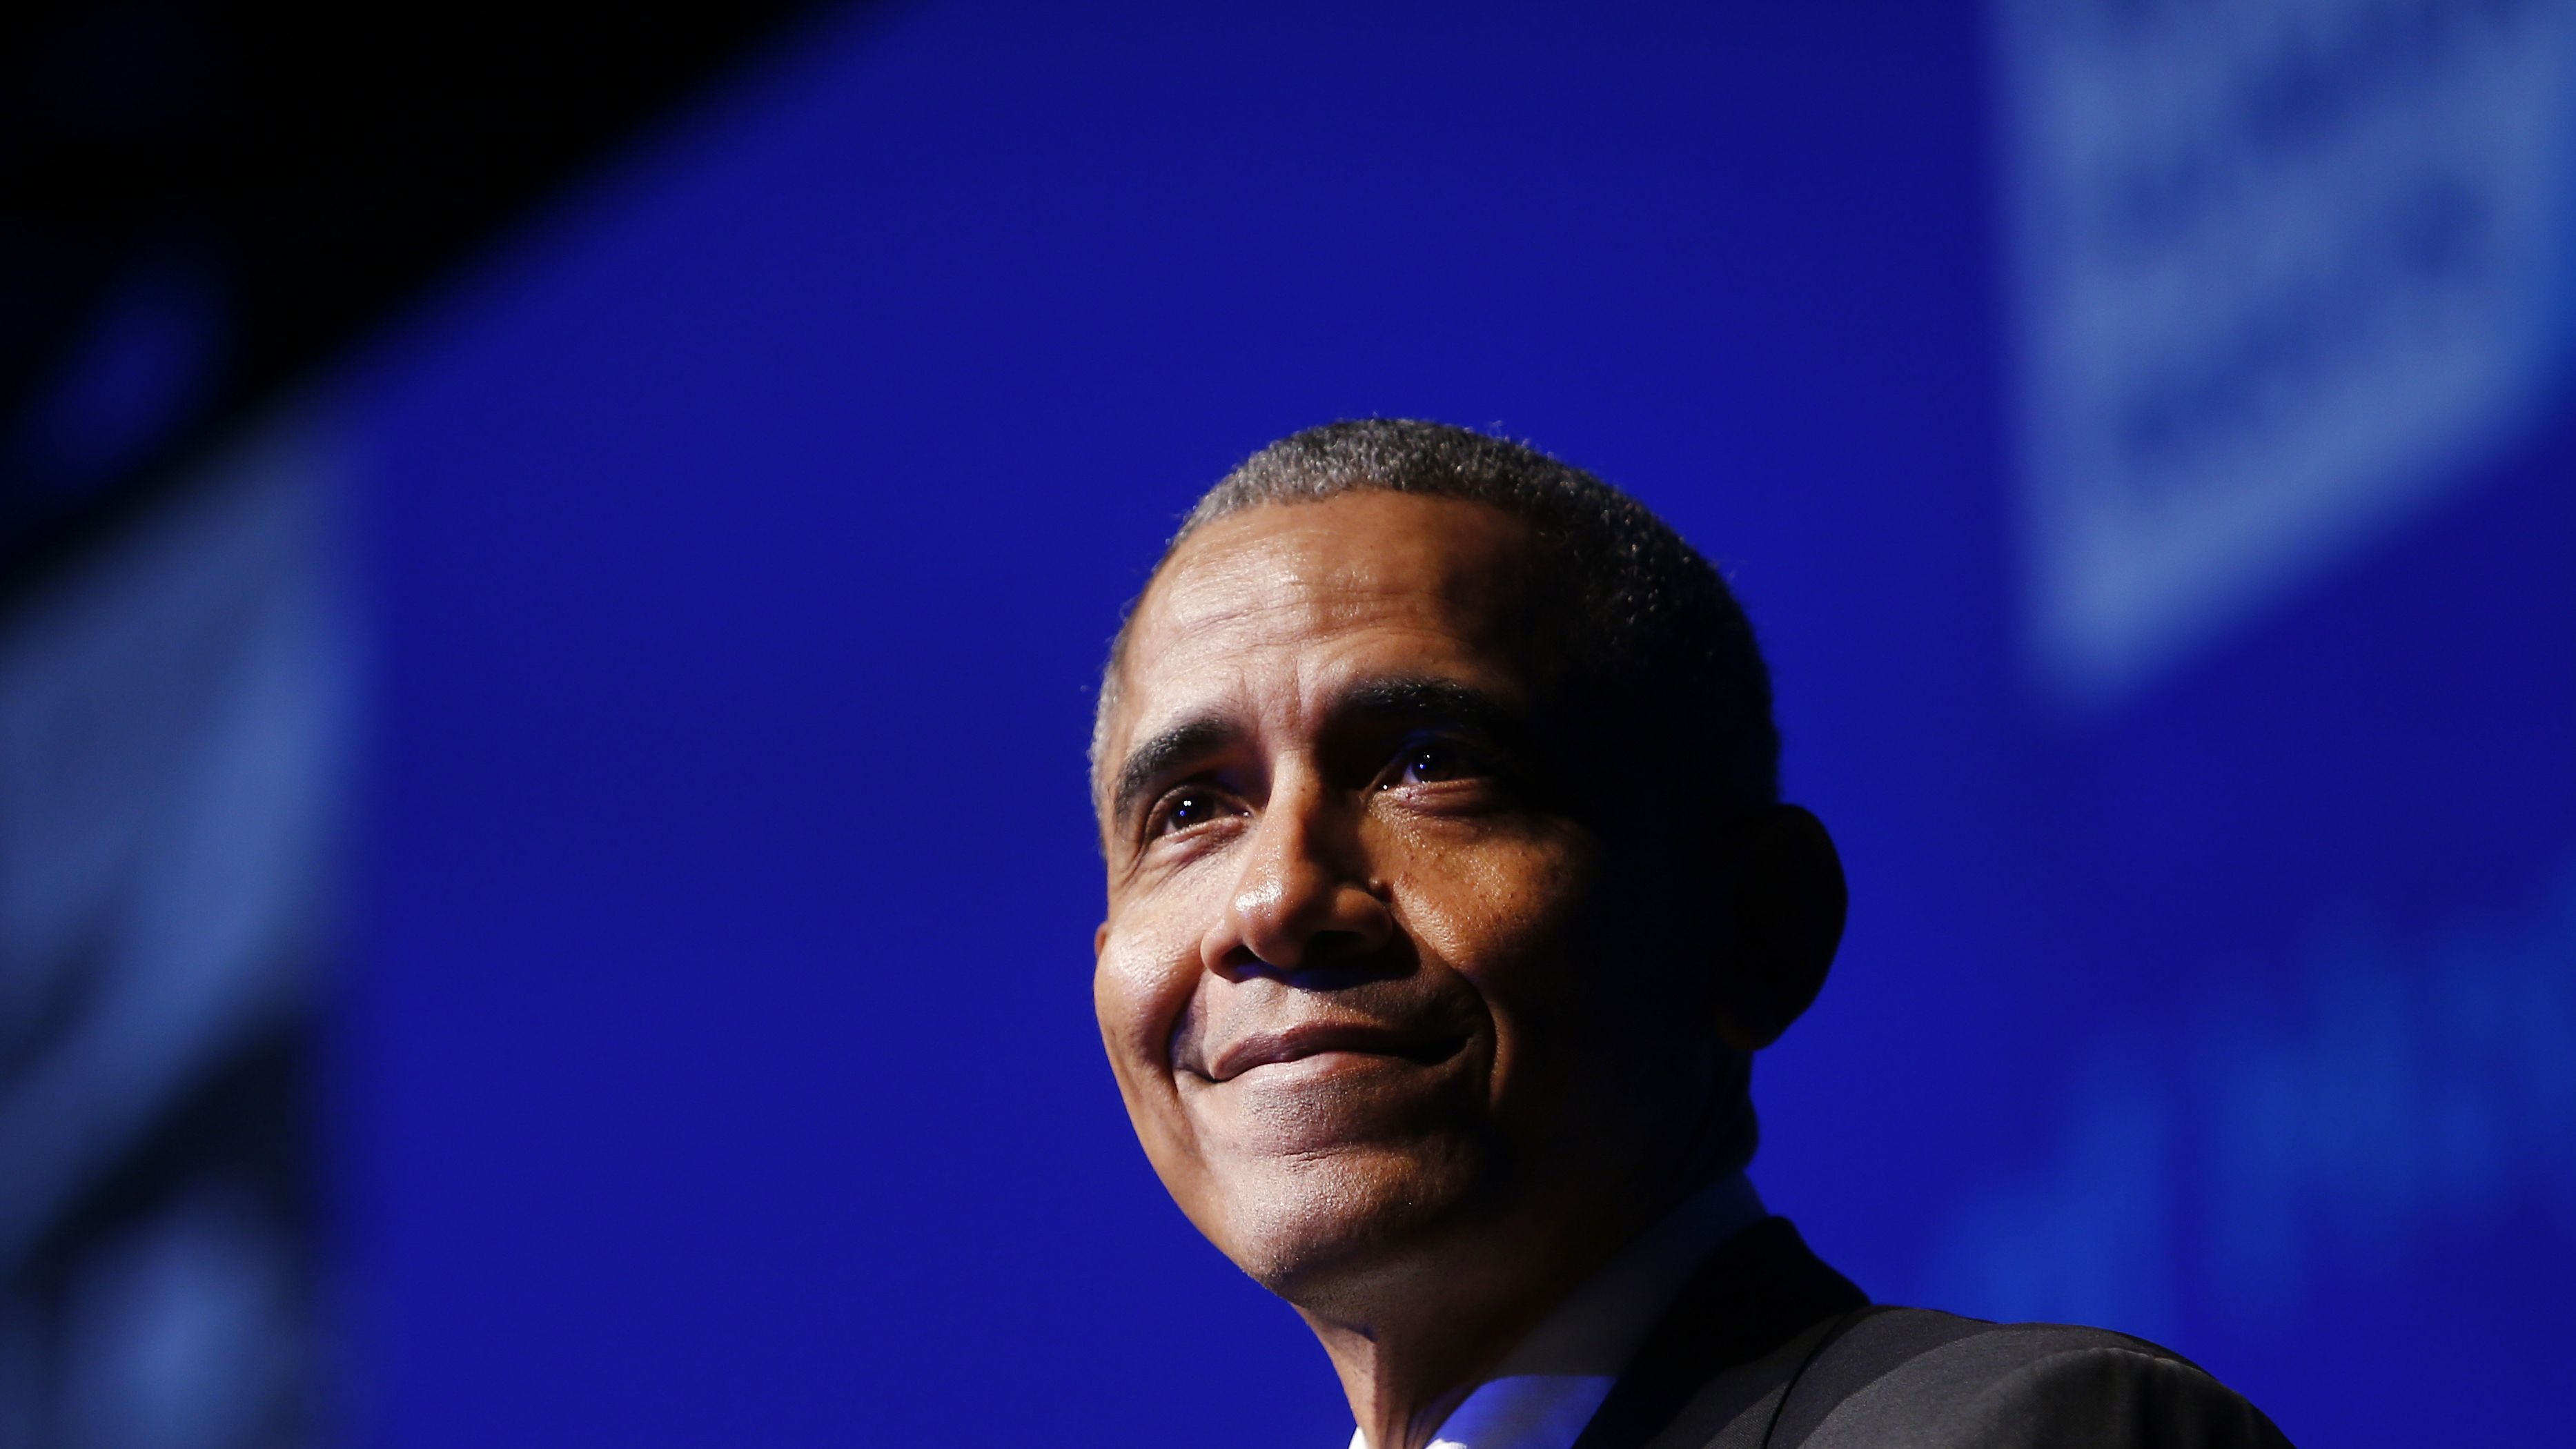 'Hamildrop' featuring Obama charts on Billboard R&B